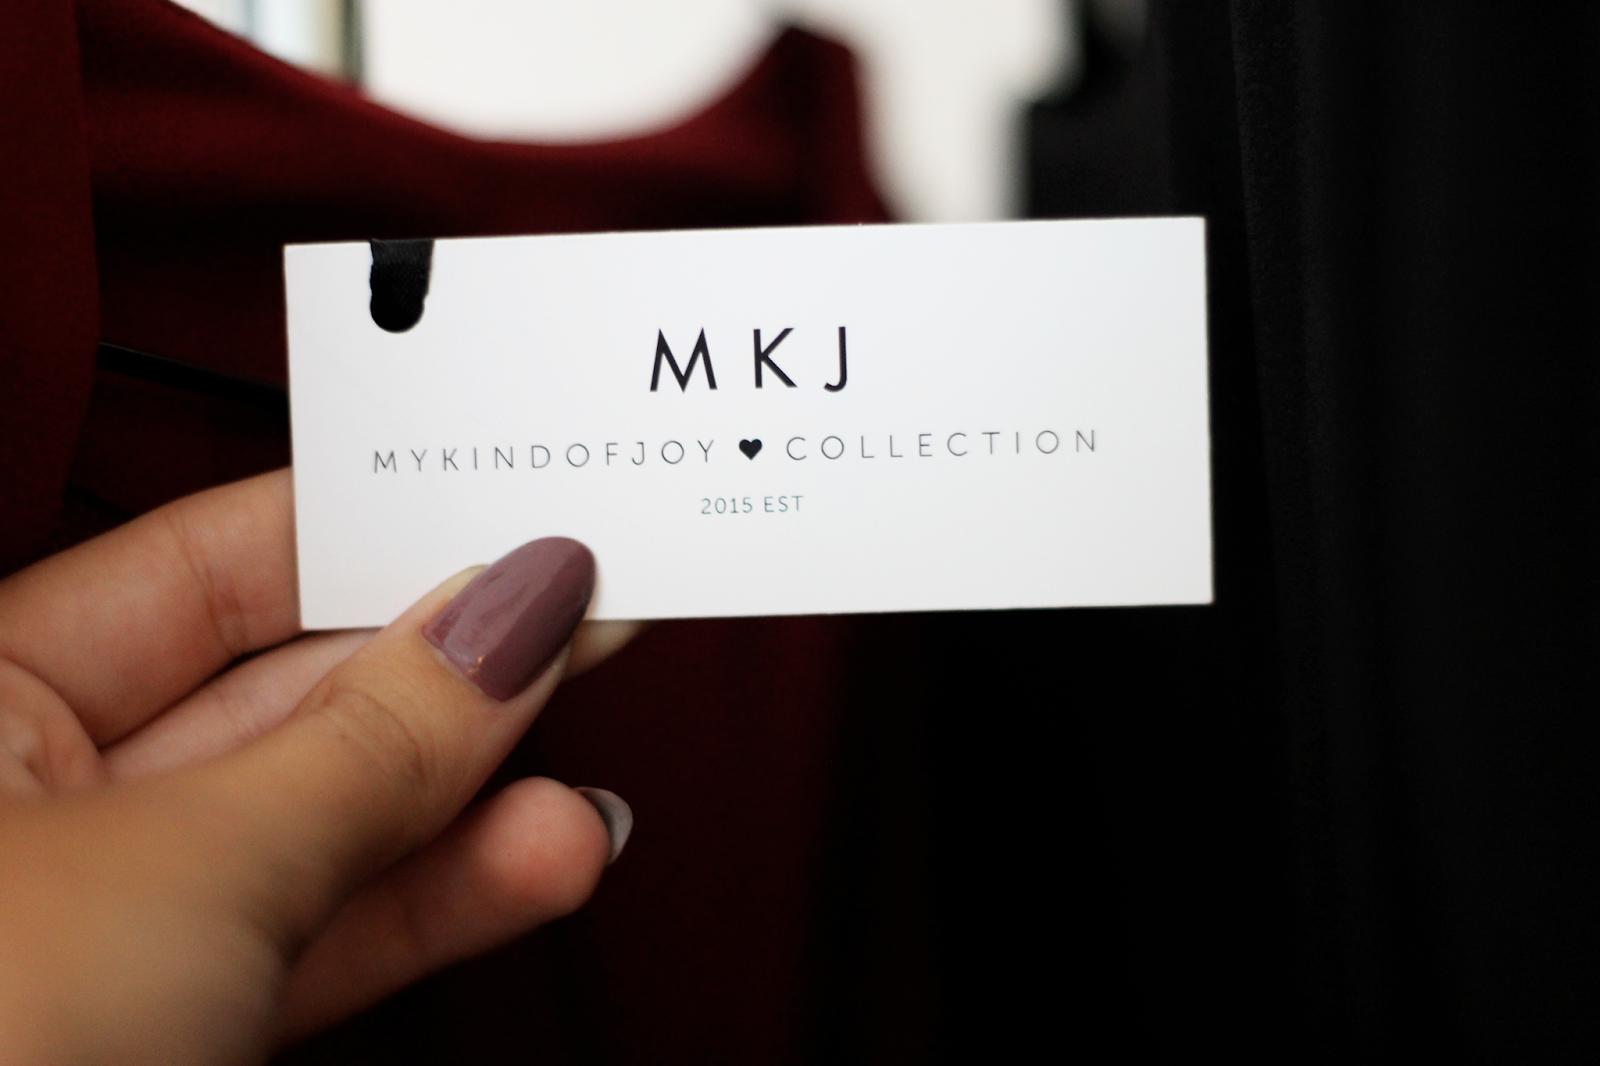 MKJ Shop Opening